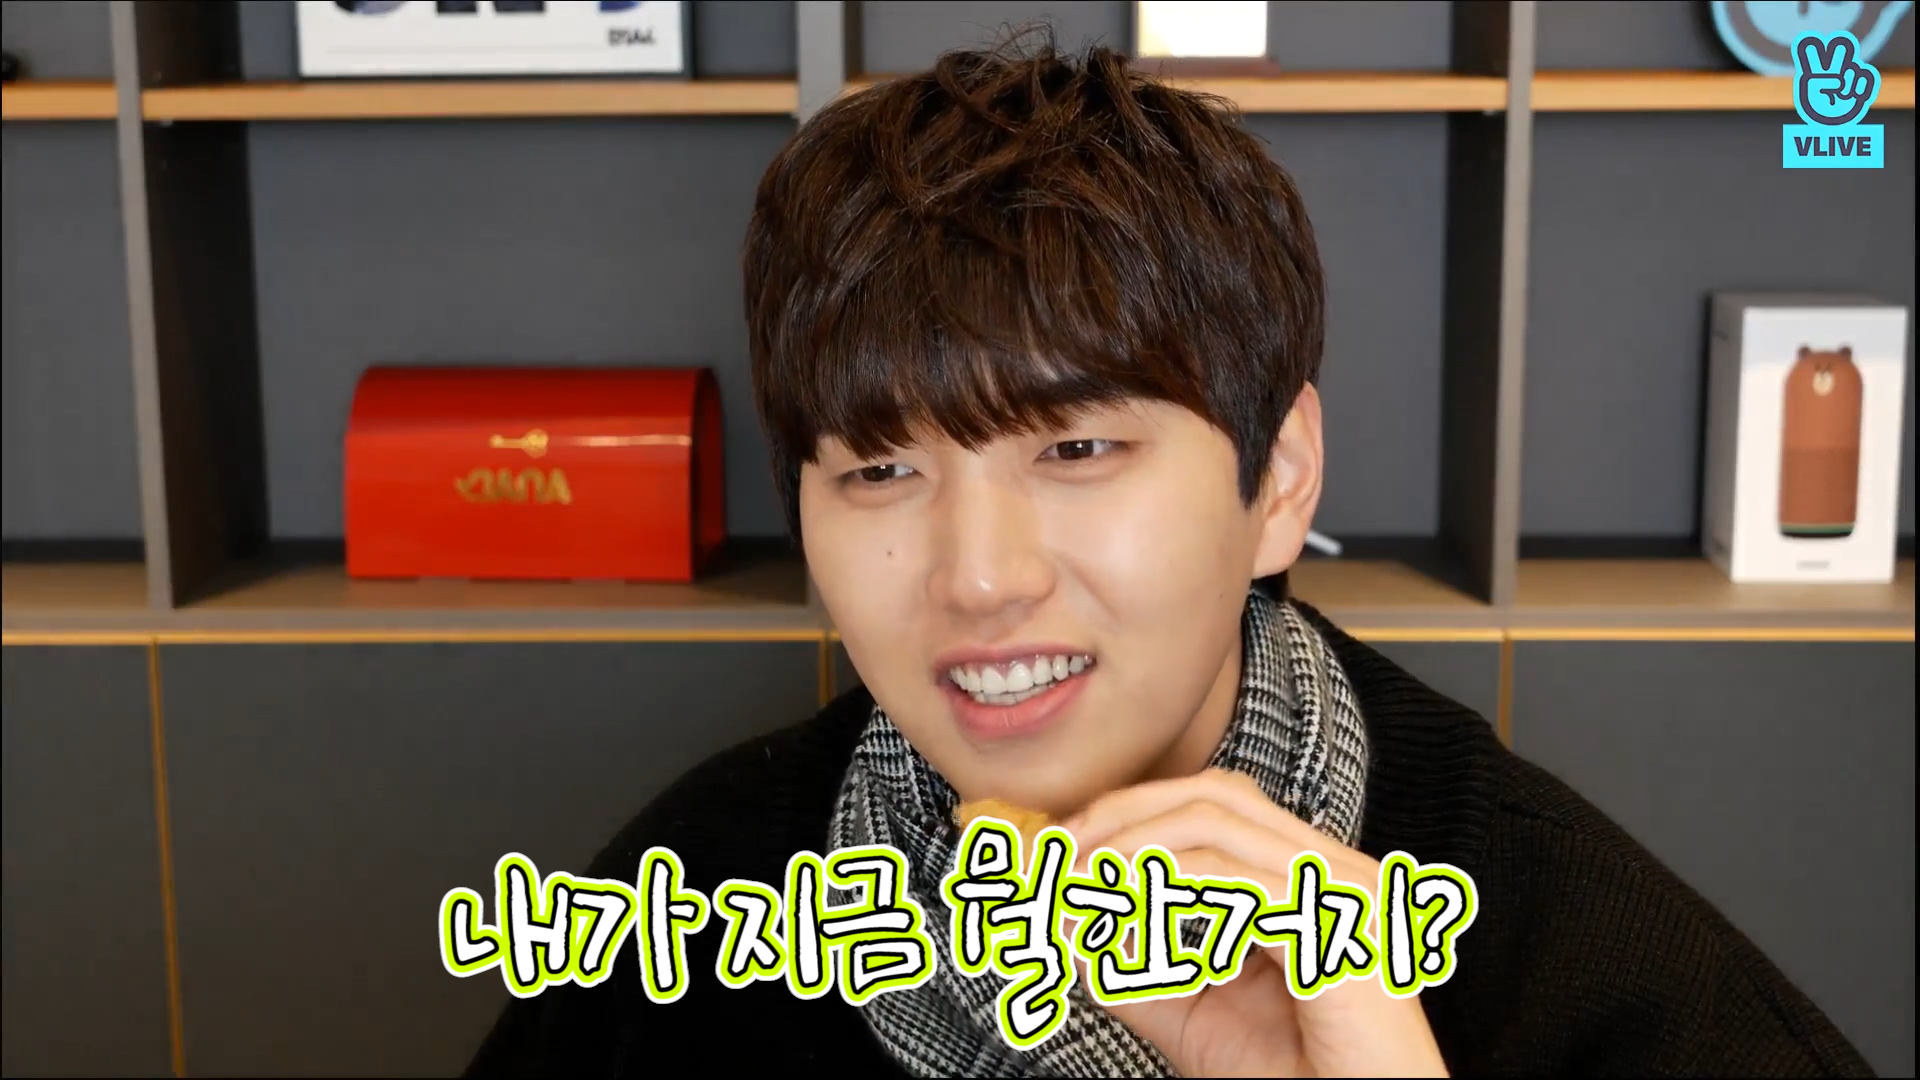 [B1A4] 이제 다시 돌이킬 수 없는 산도리의 내꼬해💓 (SANDEUL learning the cute song)